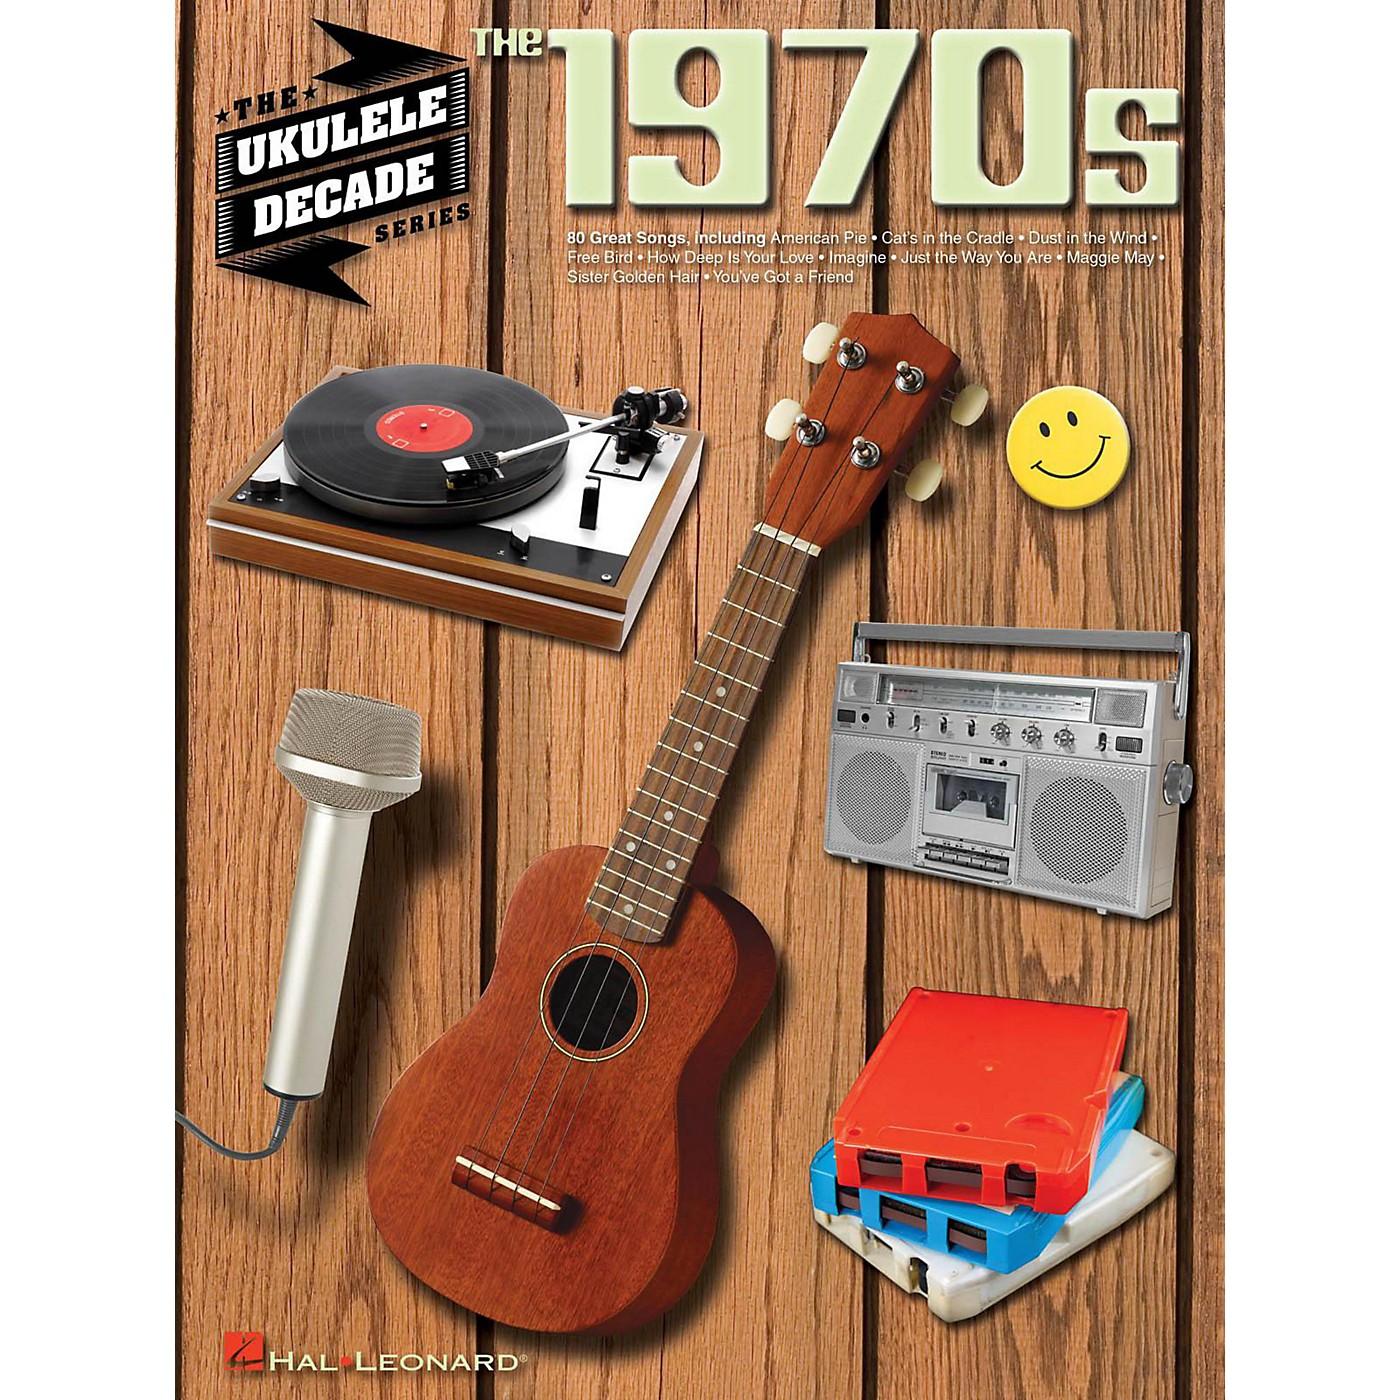 Hal Leonard The 1970s - The Ukulele Decade Series thumbnail